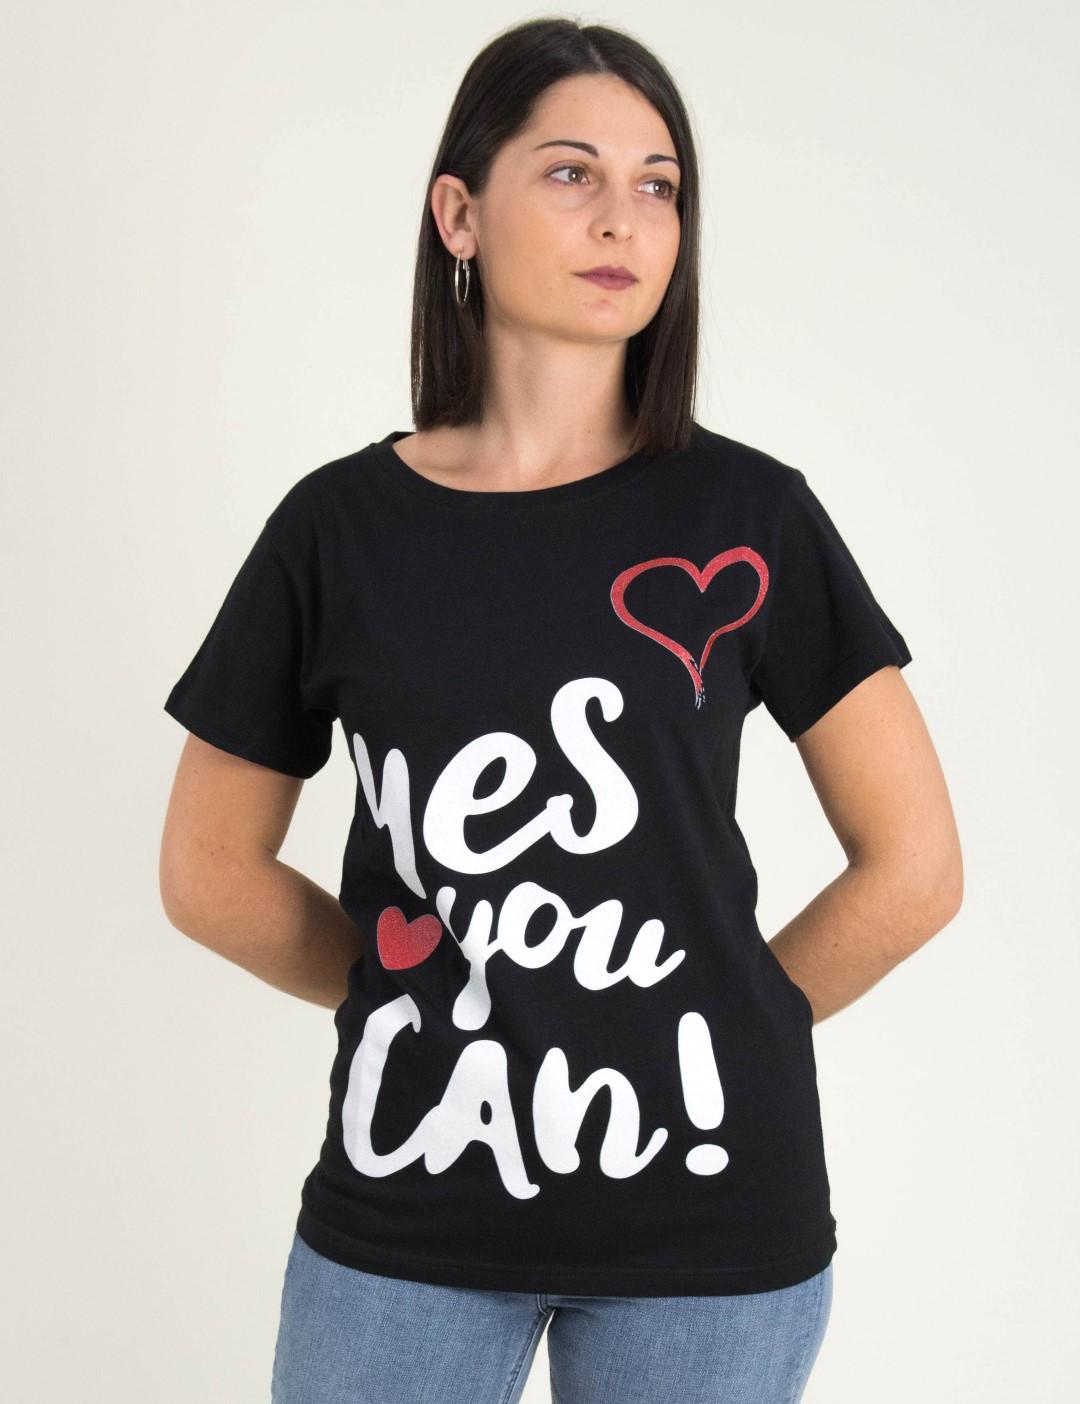 a9bd5cb55022 Γυναικεία μαύρη κοντομάνικη μπλούζα Τύπωμα Yes you can WL1804L